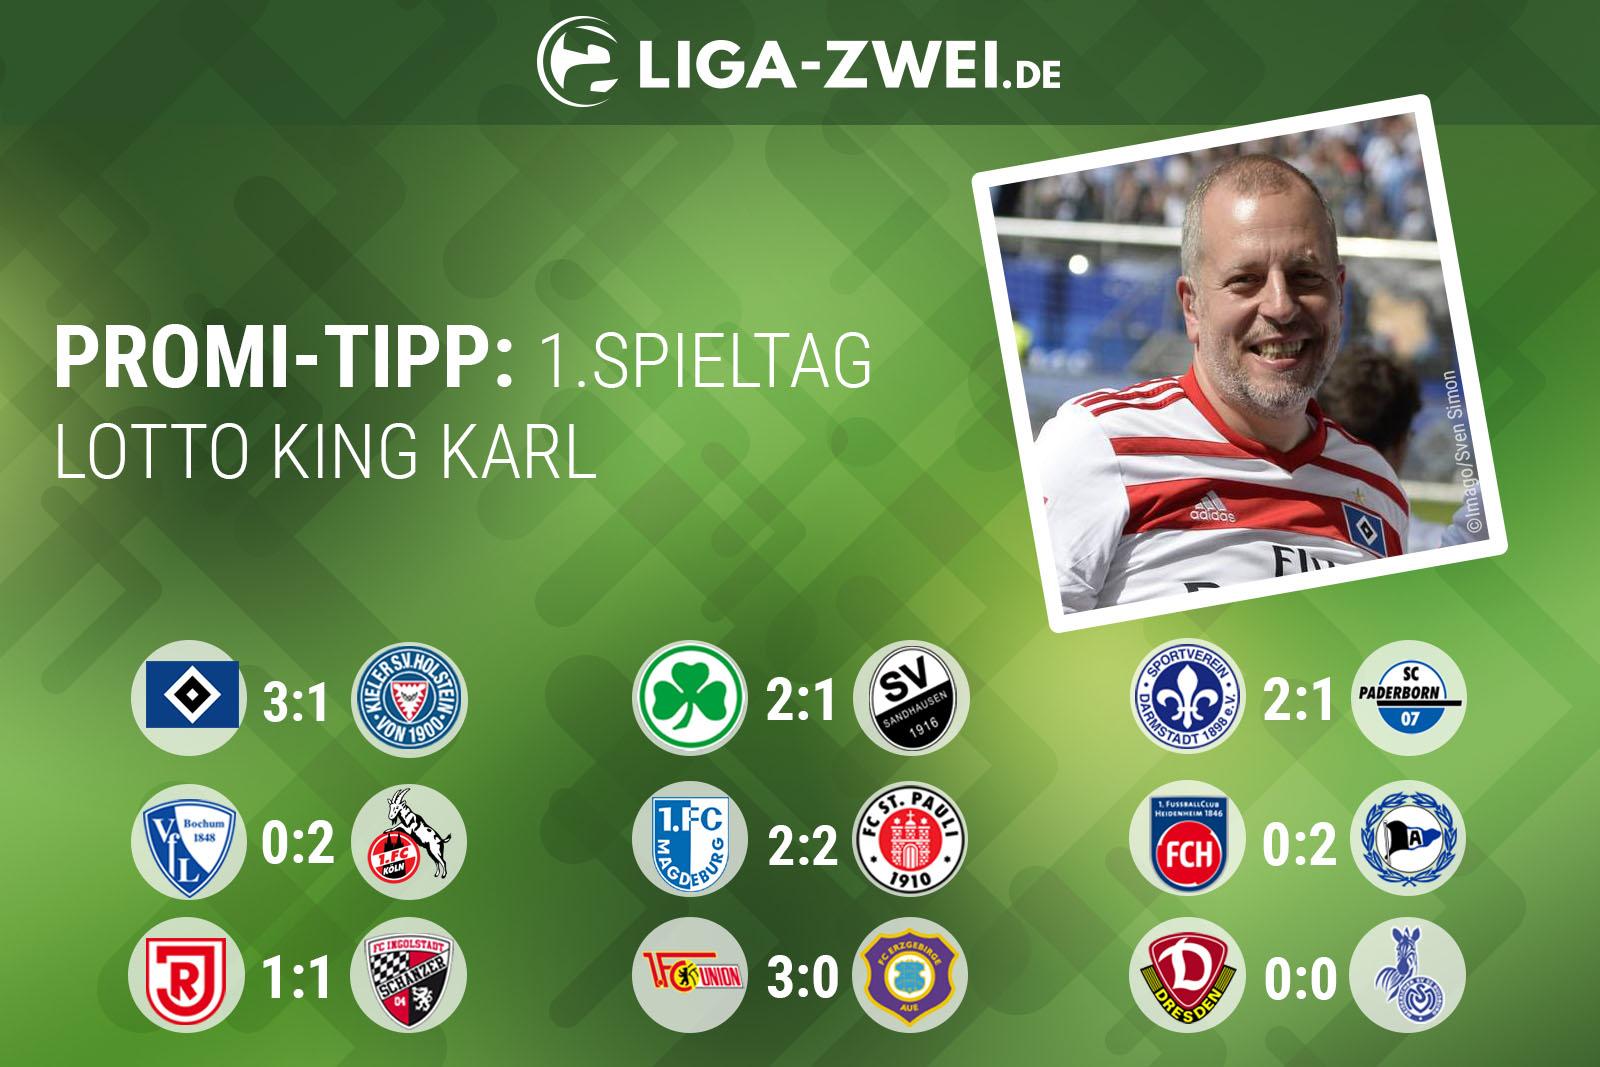 Lotto King Karl tippt 1. Spieltag der 2. Bundesliga